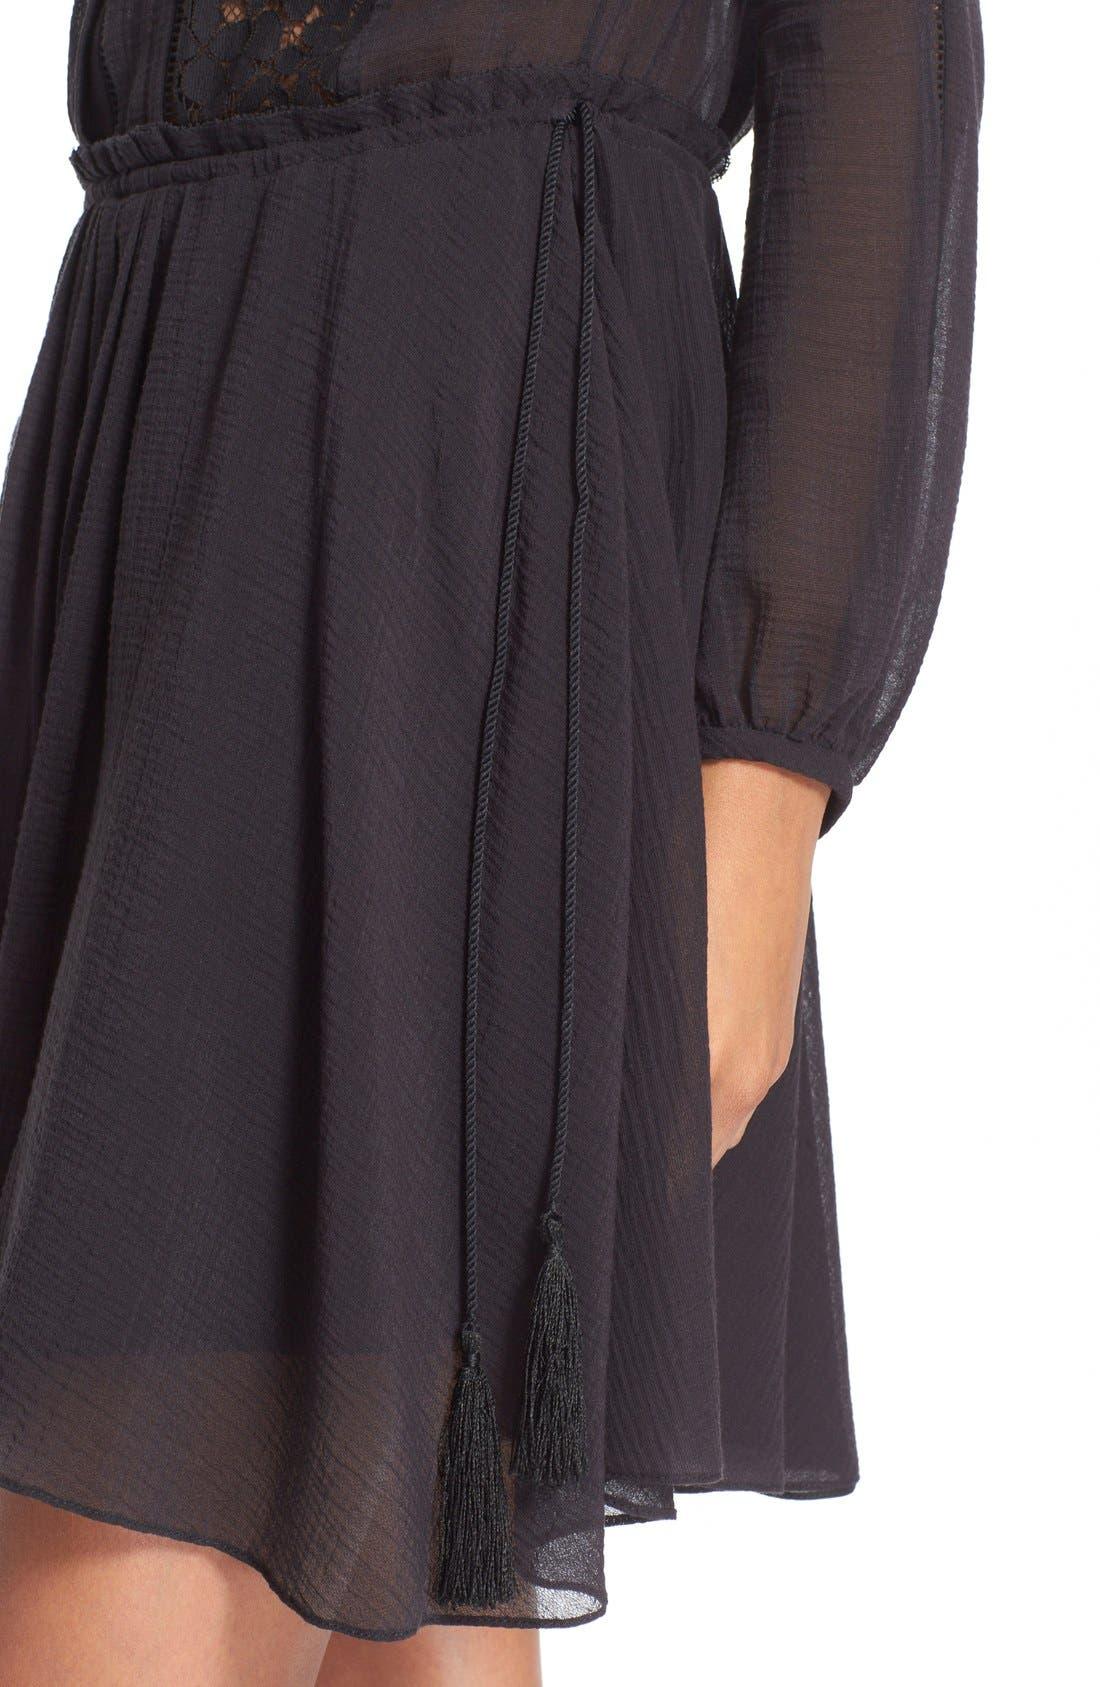 Alternate Image 4  - Derek Lam 10 Crosby Lace Inset Dress